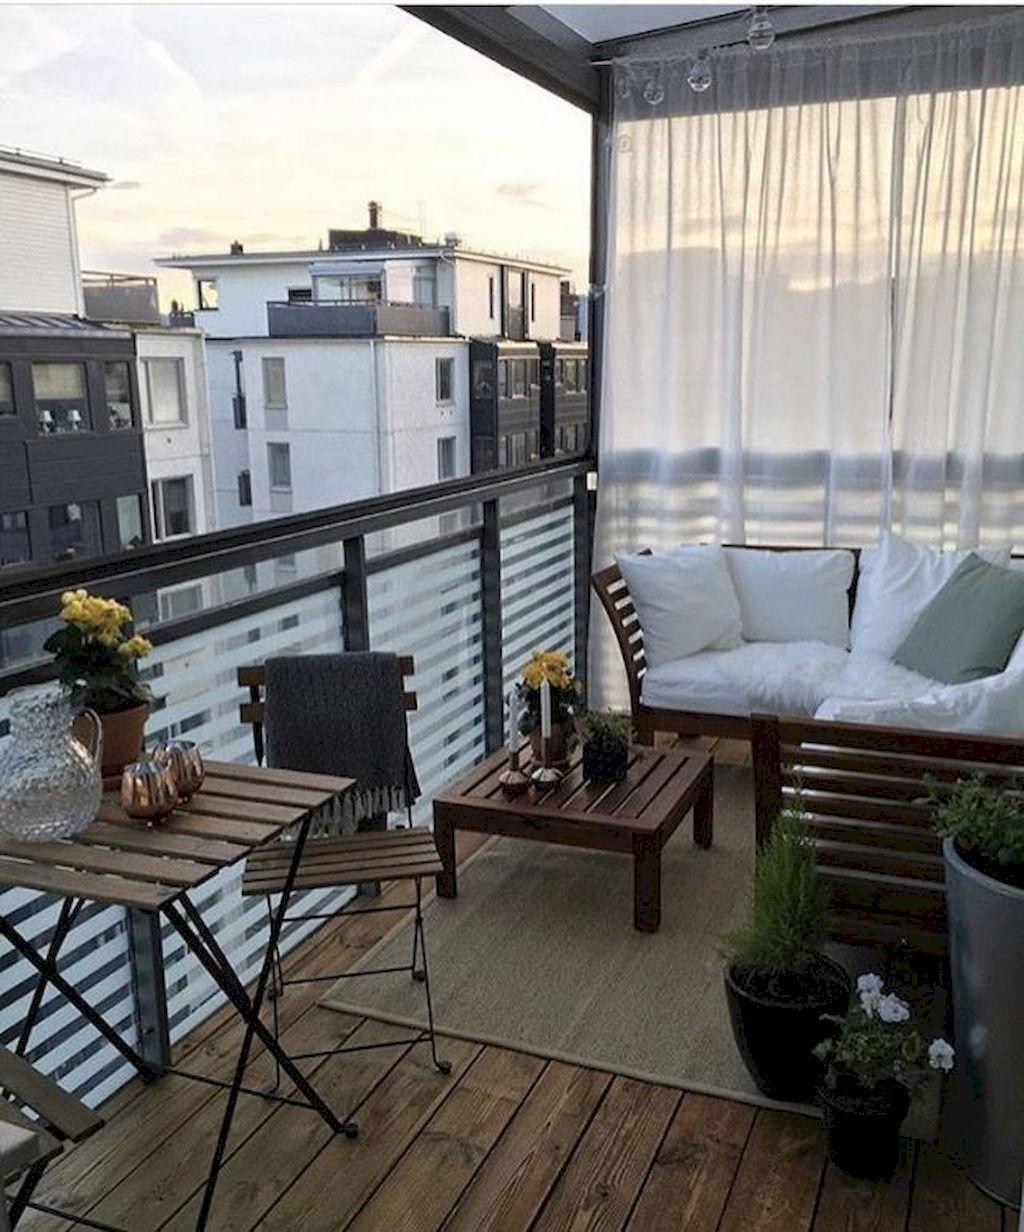 58 Cozy Apartment Balcony Decorating Ideas on A Budget ...